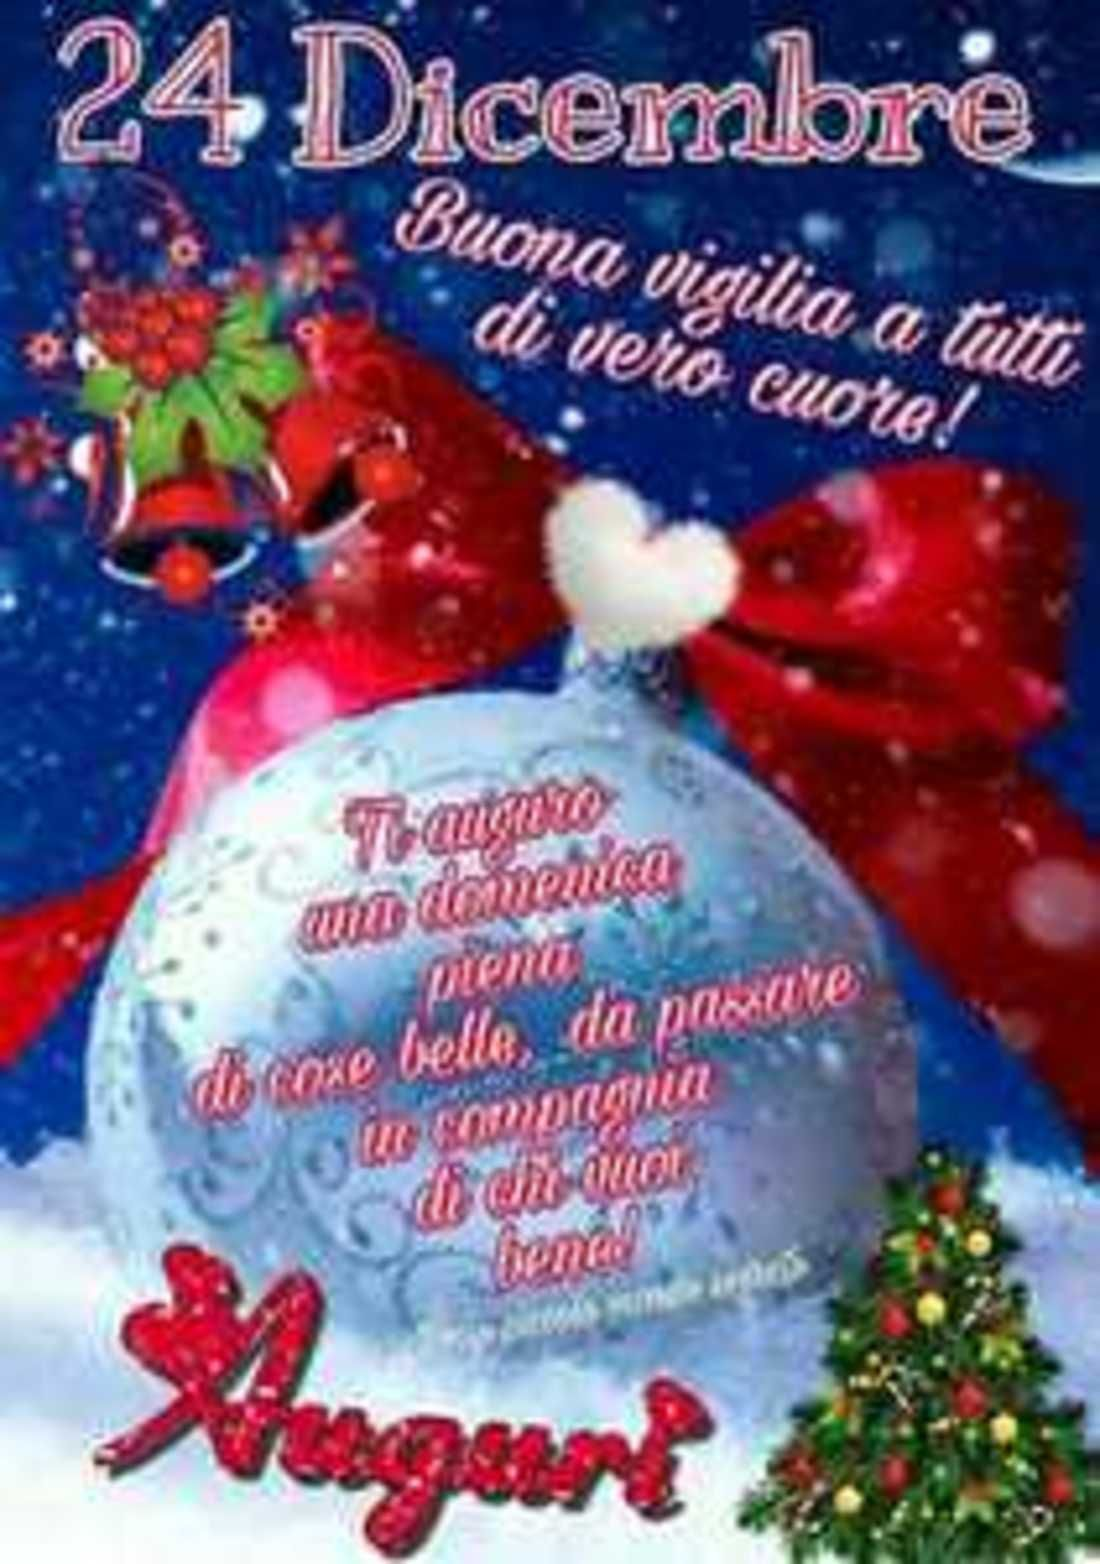 Immagini Di Natale Bellissime.Belle Immagini Vigilia Di Natale 3 Buona Vigilia Di Natale